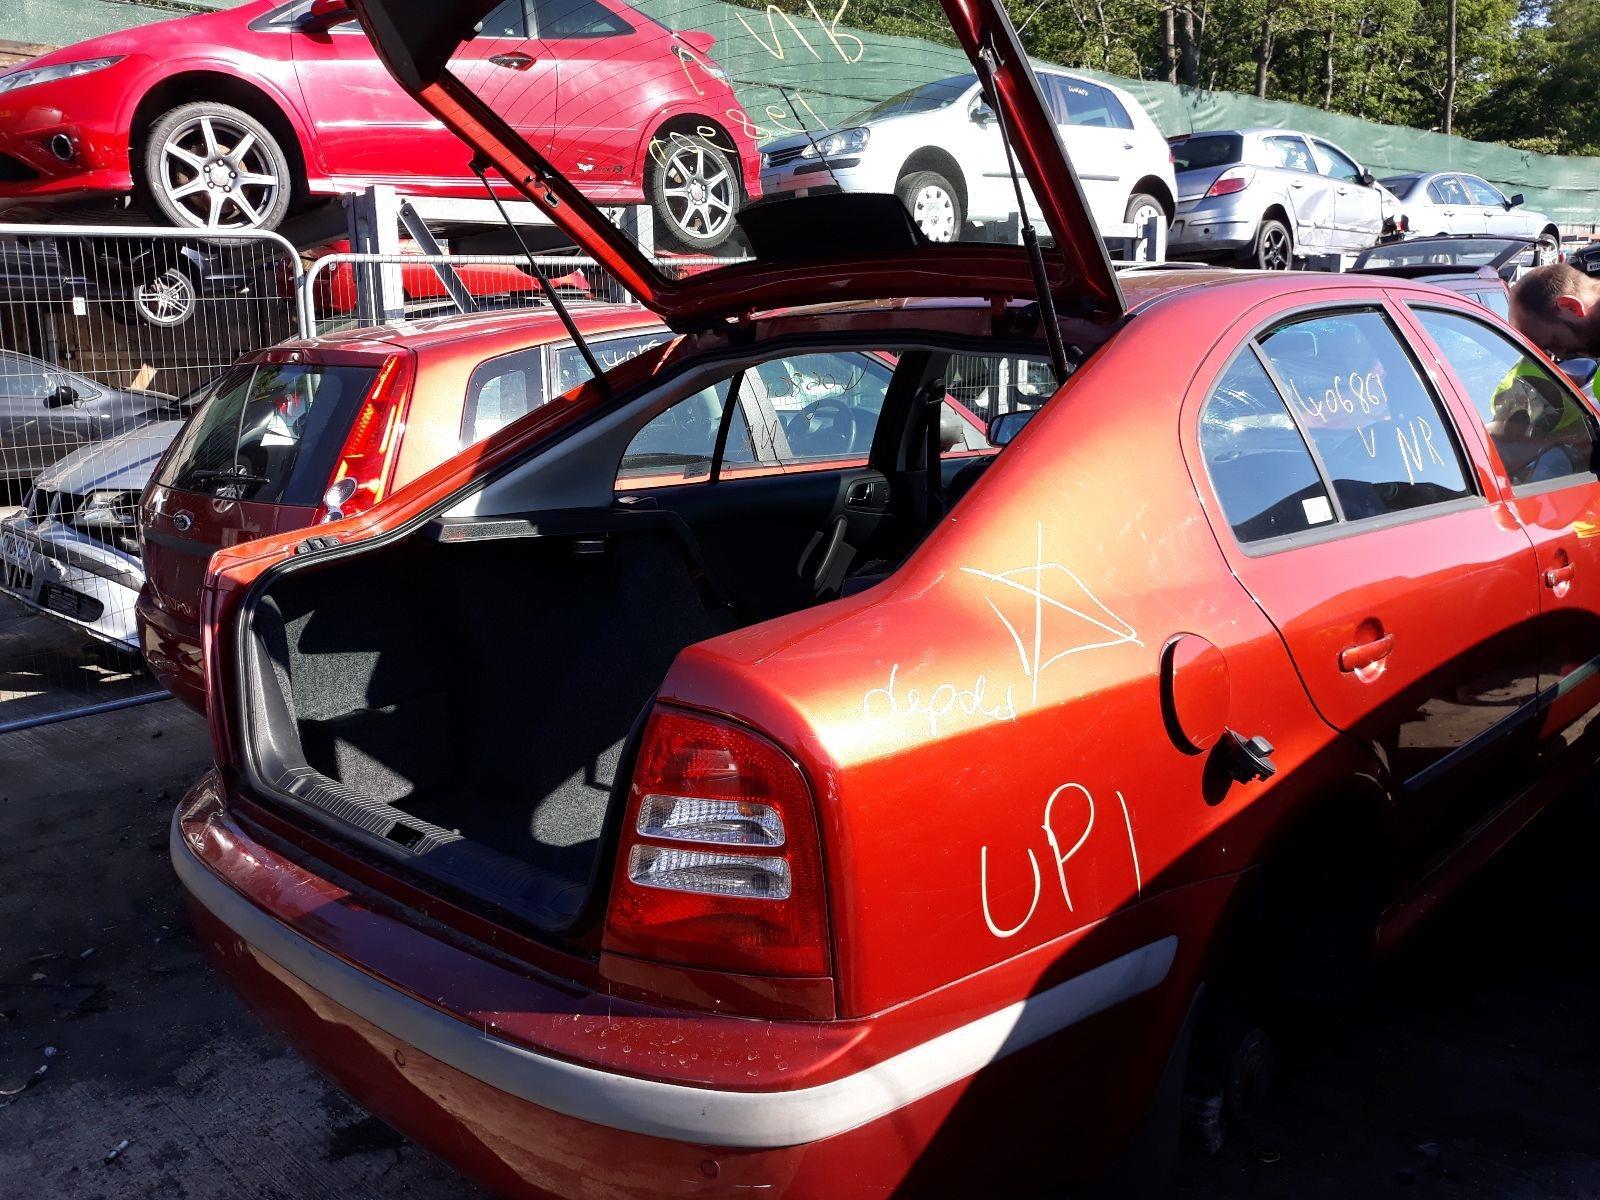 Skoda Octavia 2000 To 2005 Elegance 5 Door Hatchback Scrap Fuse Box 2006 Salvage Car For Sale Auction Silverlake Autoparts